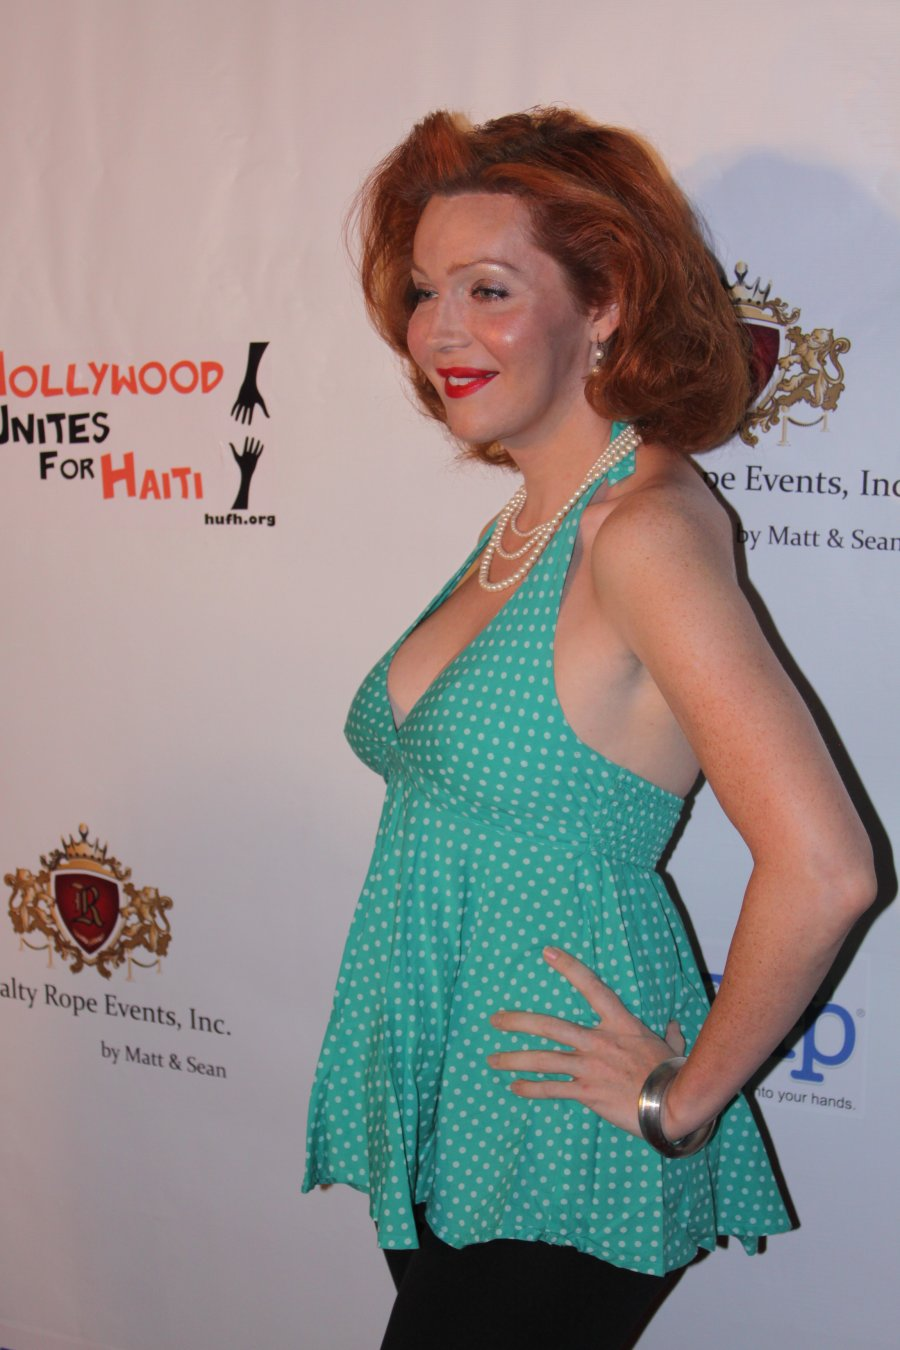 Hollywood Unites for Haiti Event